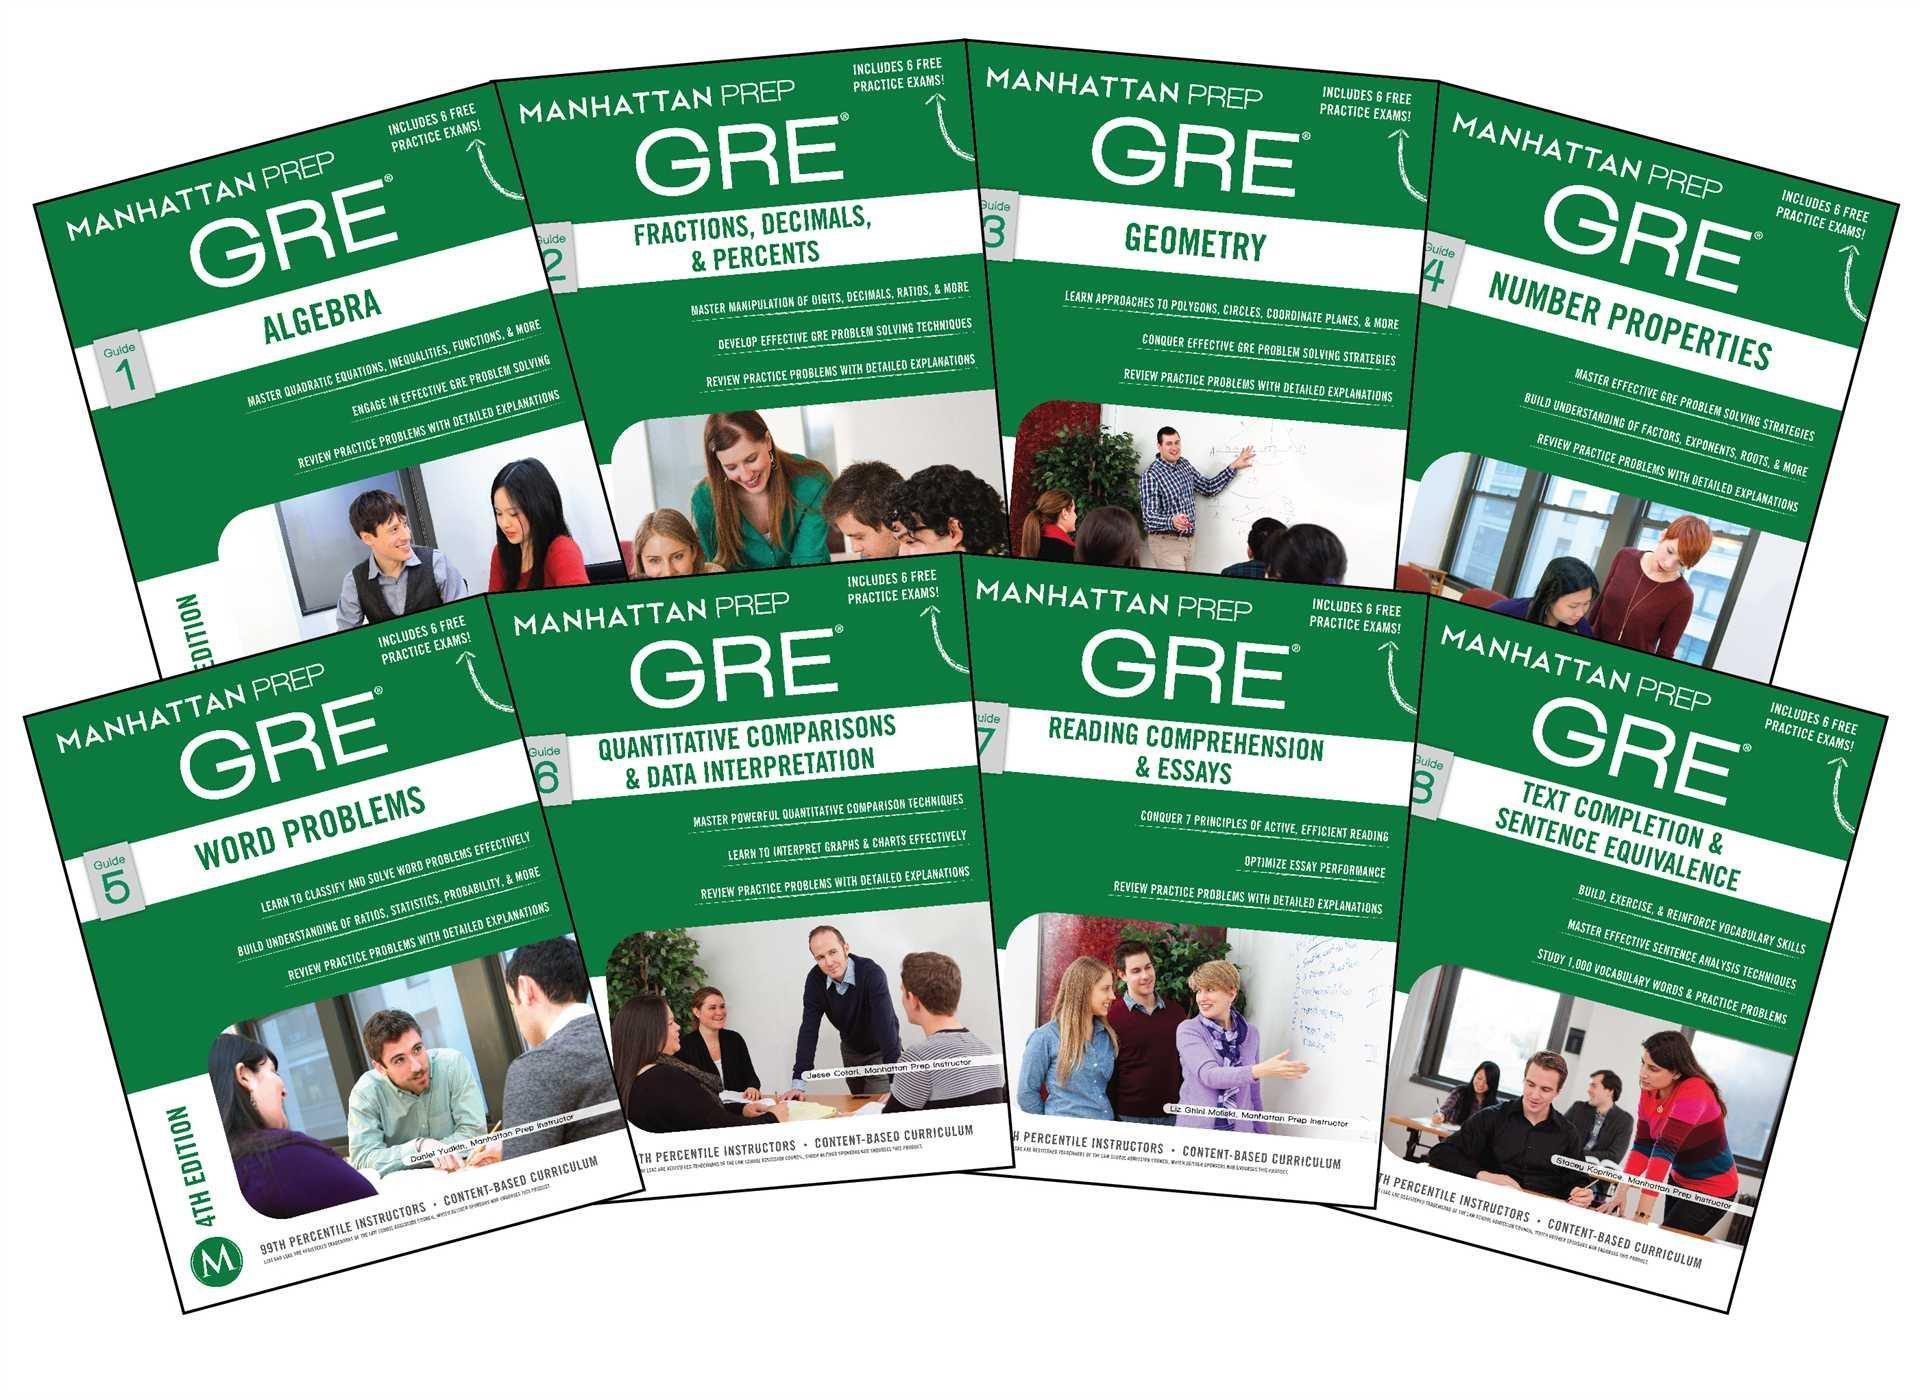 Manhattan Prep GRE Set of 8 Strategy Guides (Manhattan Prep GRE Strategy Guides) Fourth Edition Nhật Bản